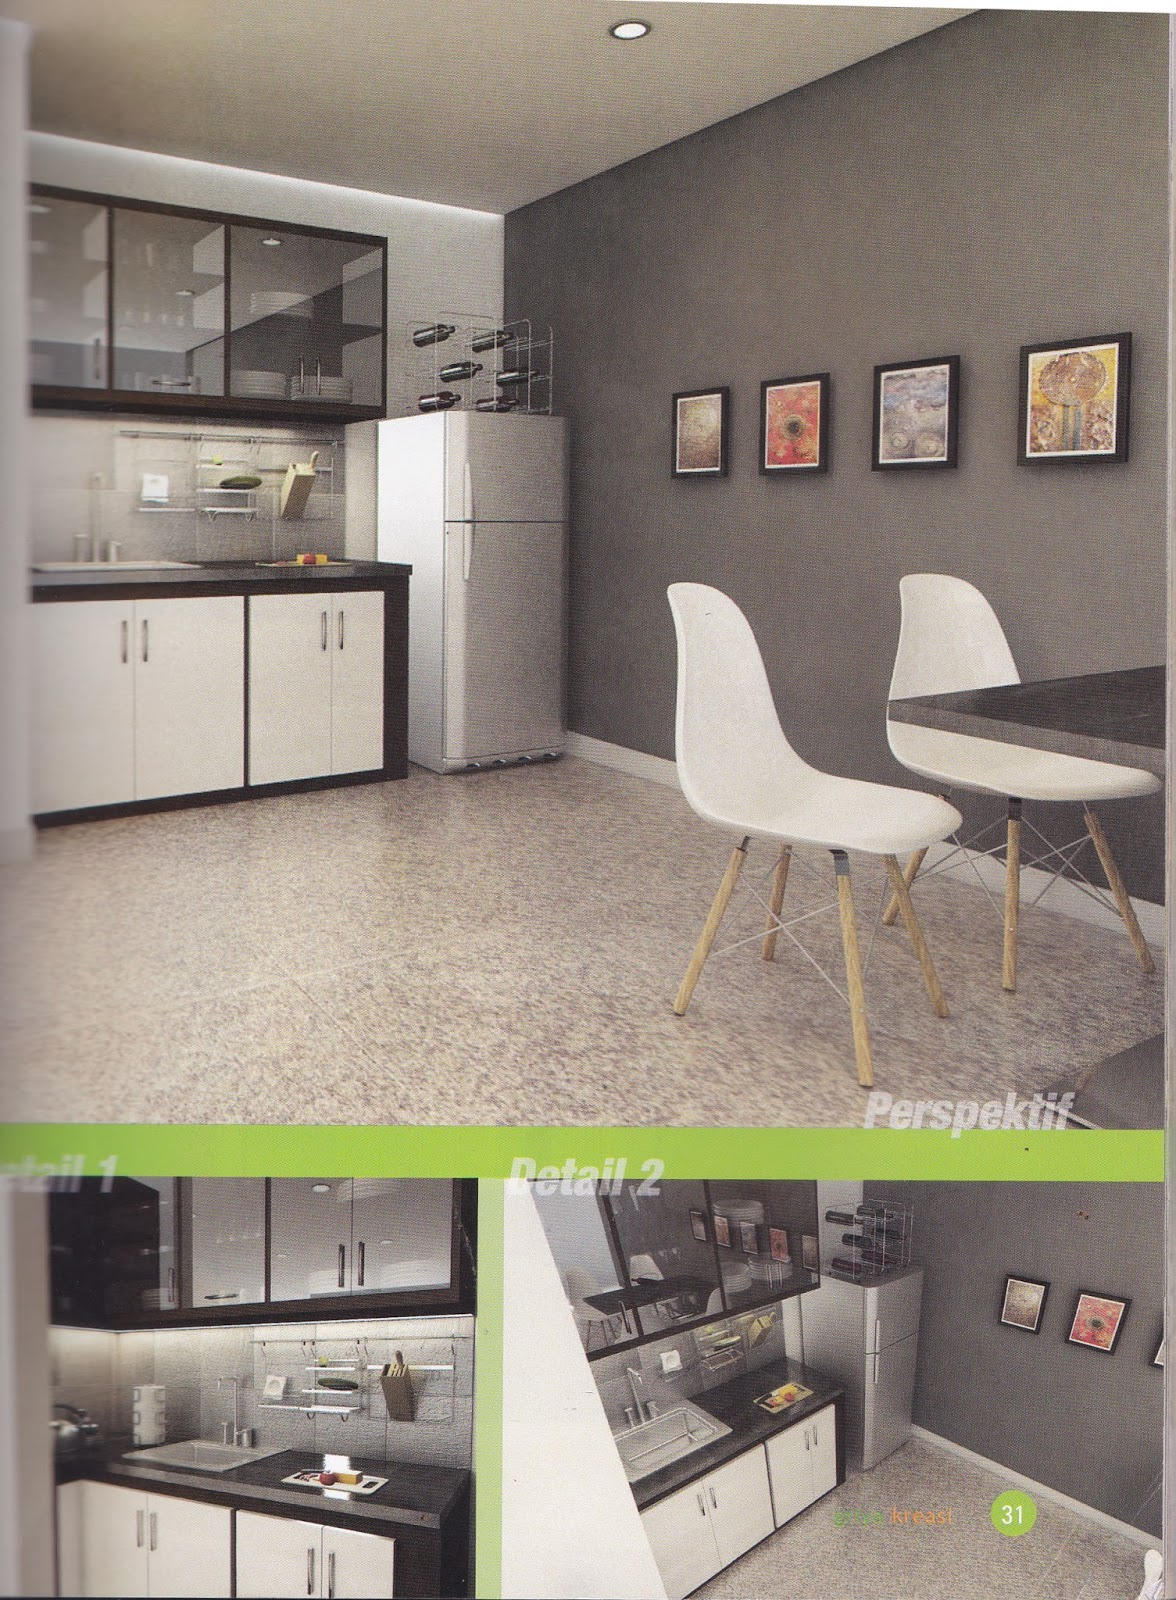 Desain Kitchen Set Warna Coklat Elegan 4 95 Juta Untuk Dapur Mungil